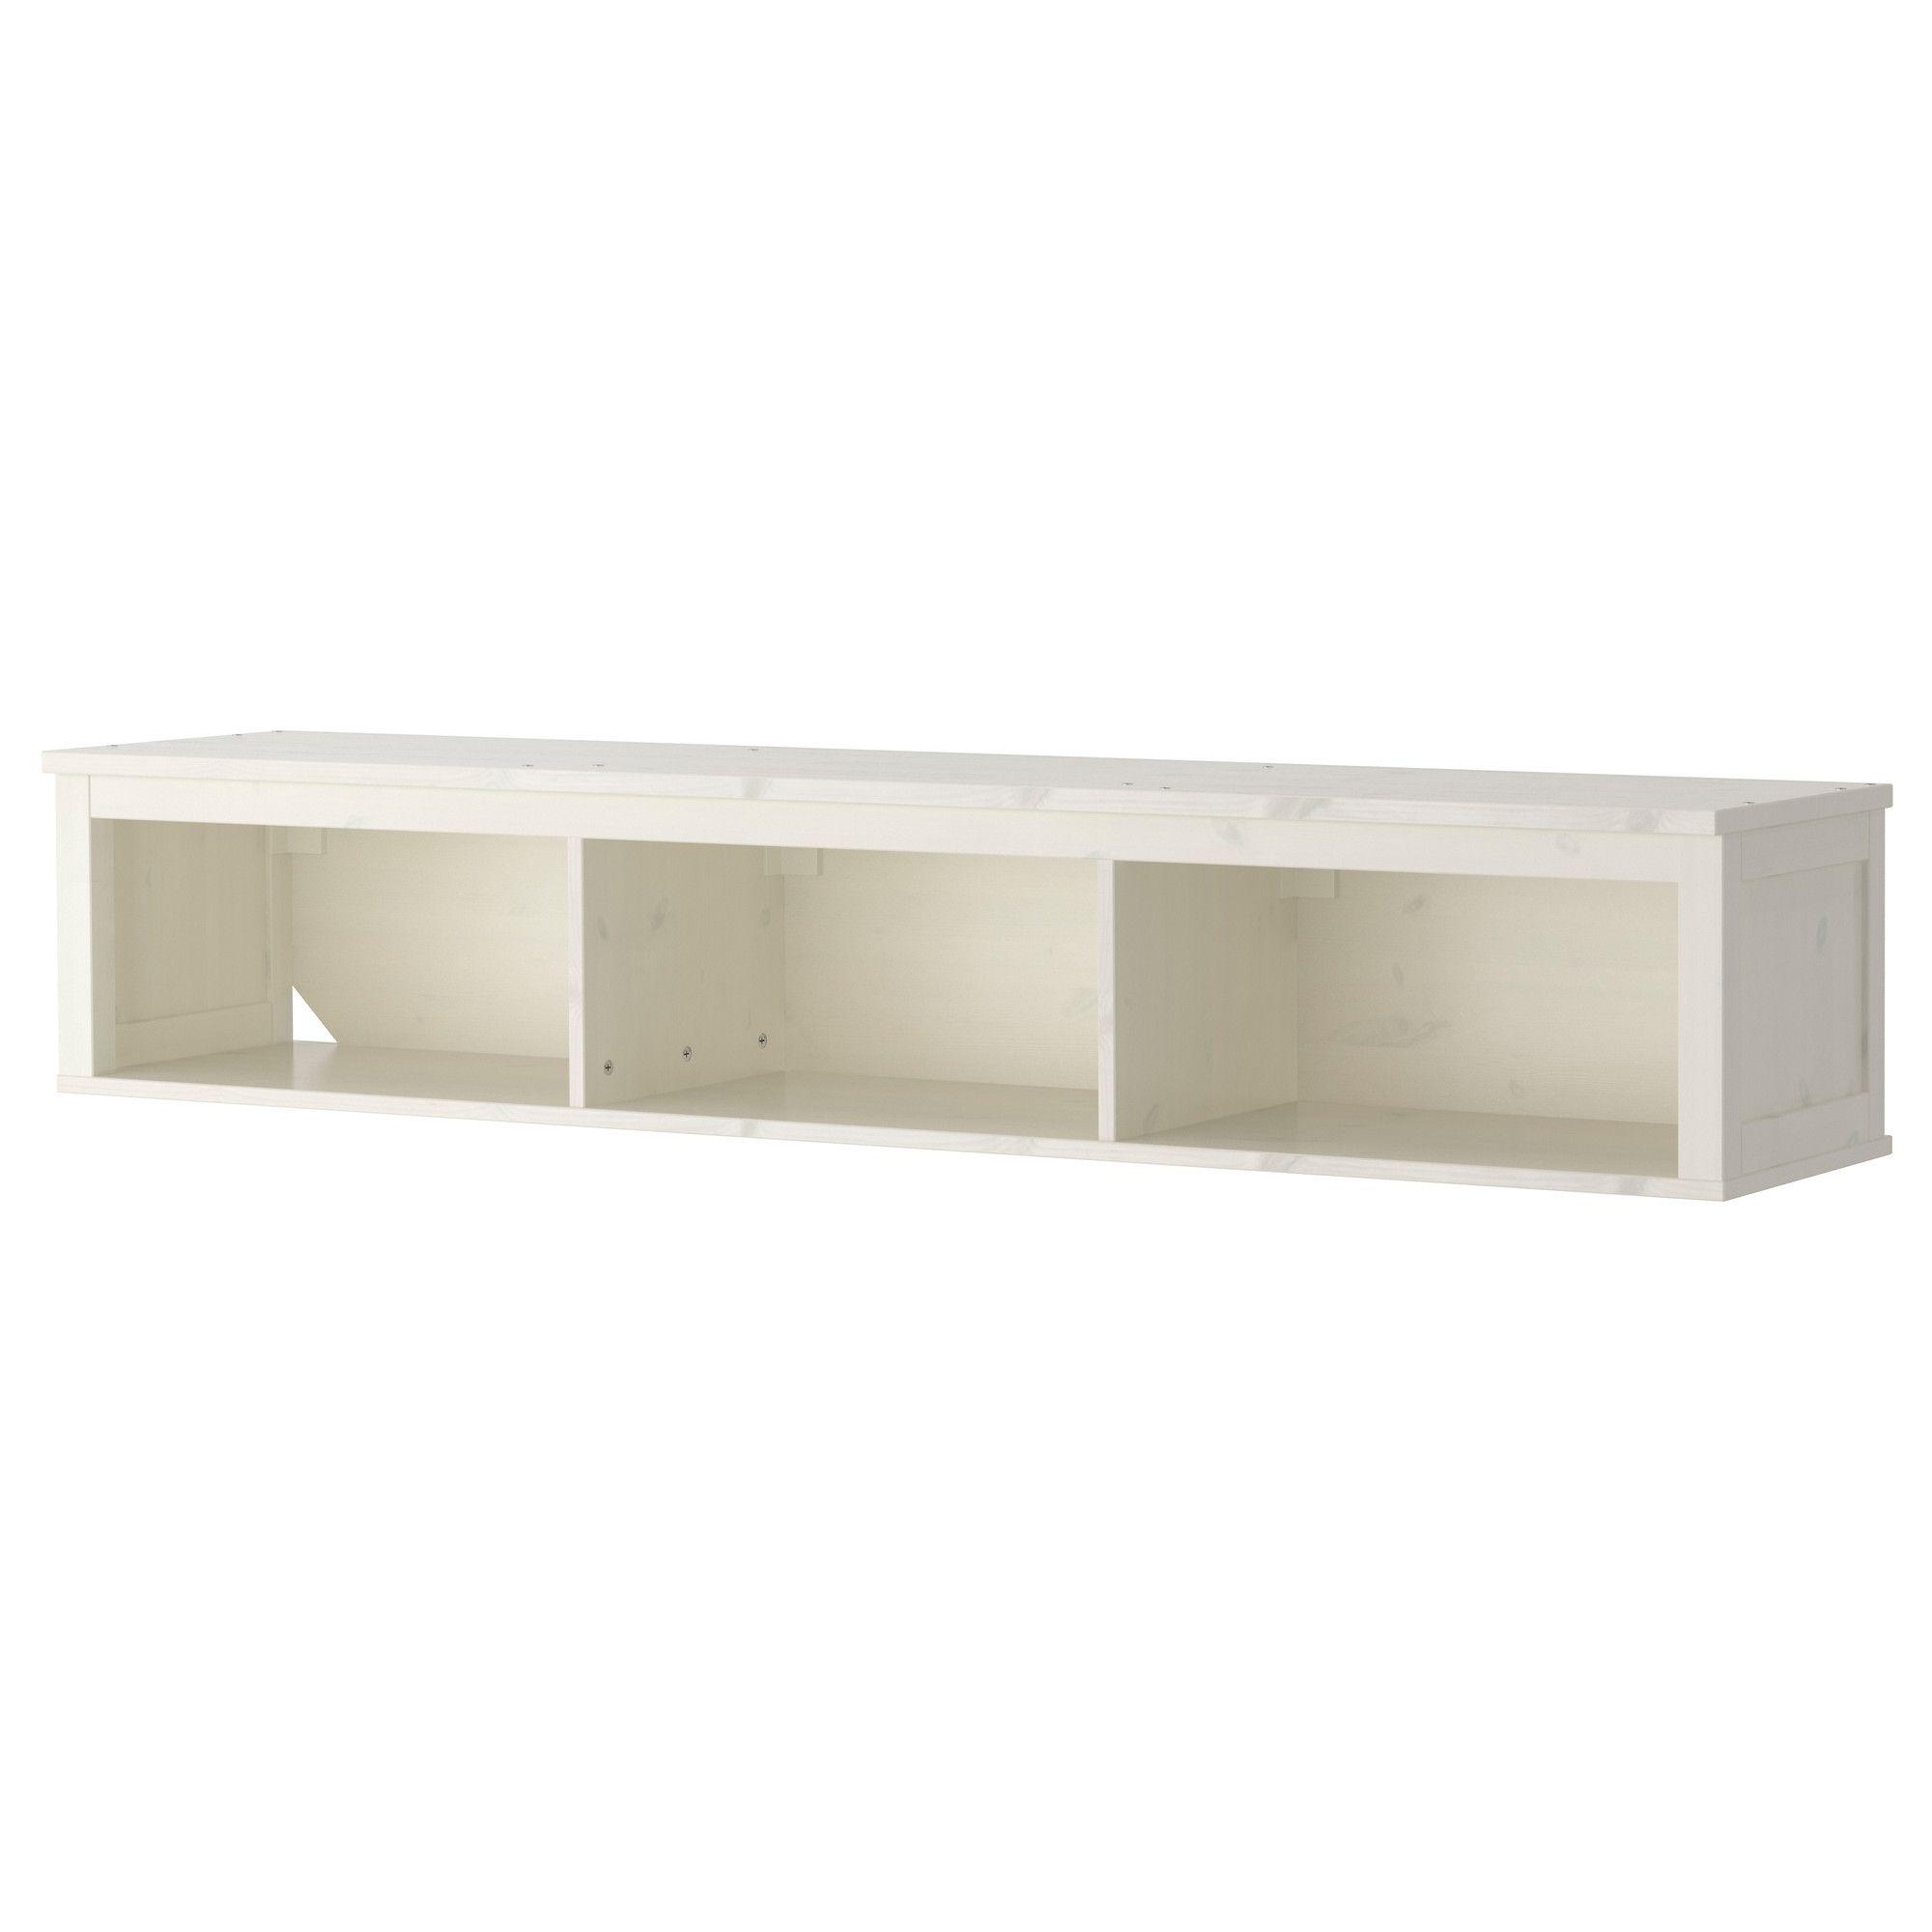 Fresh Home Furnishing Ideas And Affordable Furniture Ikea Wall Shelves Ikea Wall Hemnes